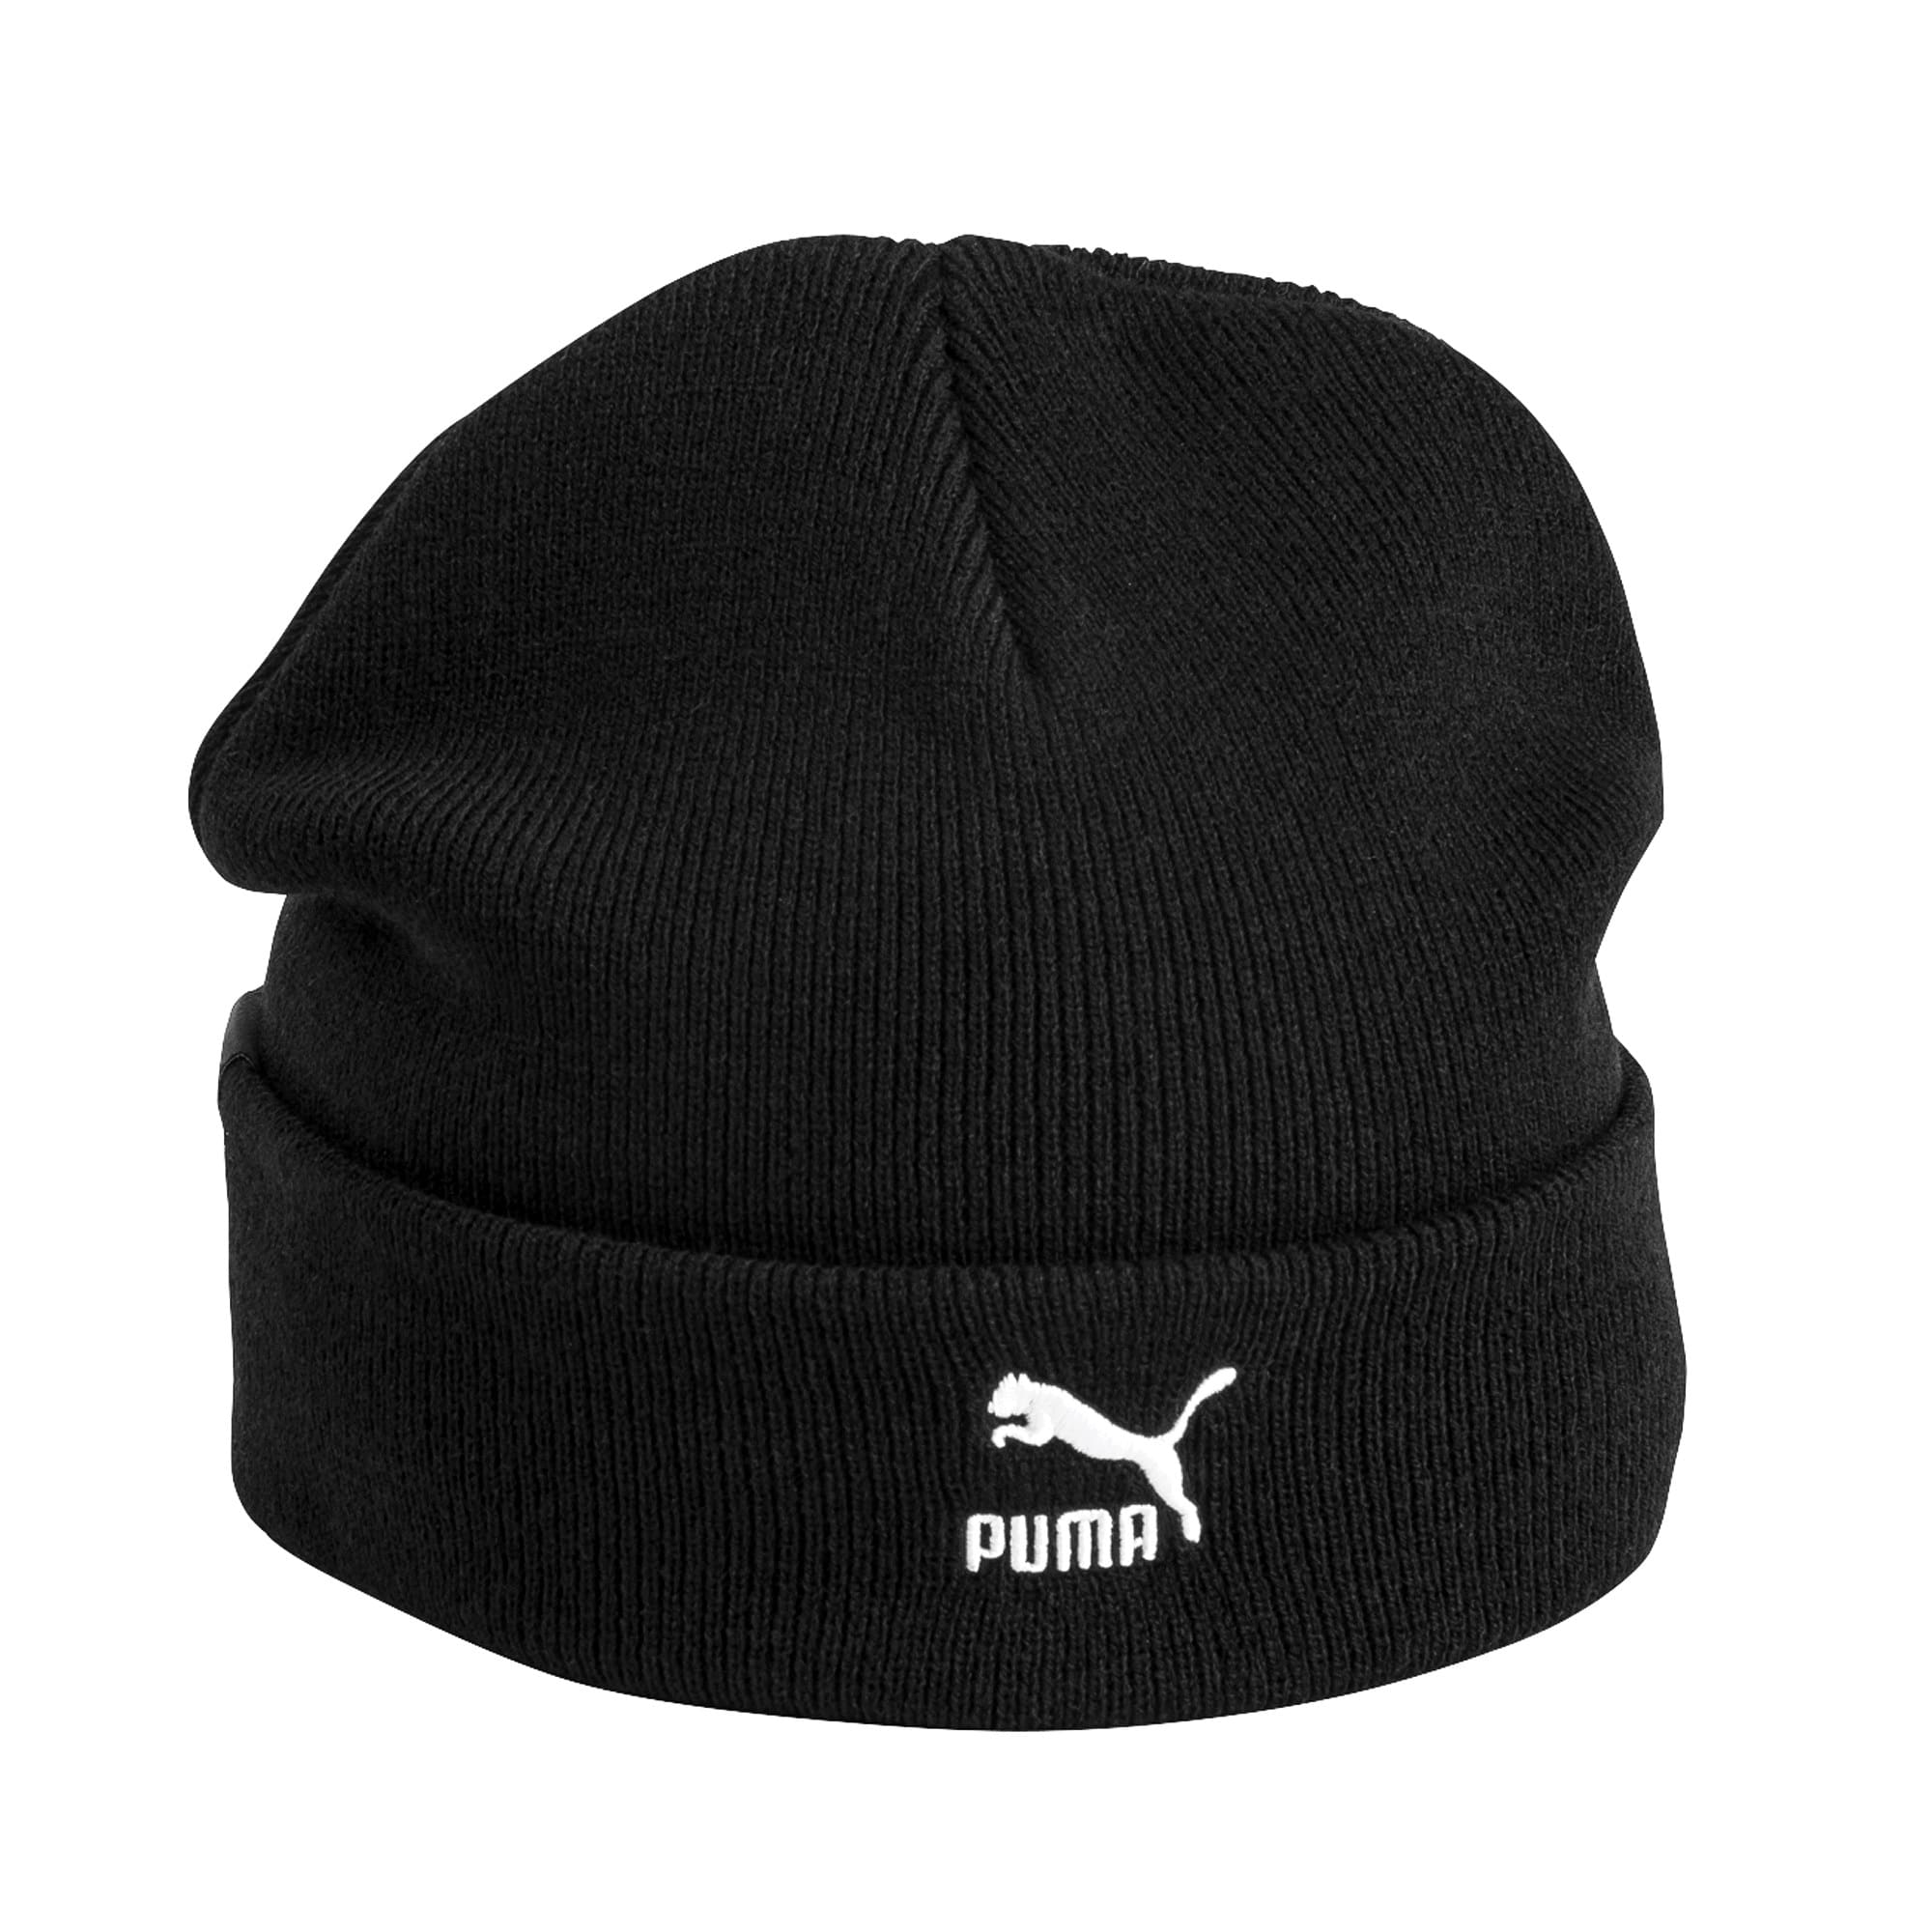 Thumbnail 4 of Archive Mid Fit Beanie, Puma Black, medium